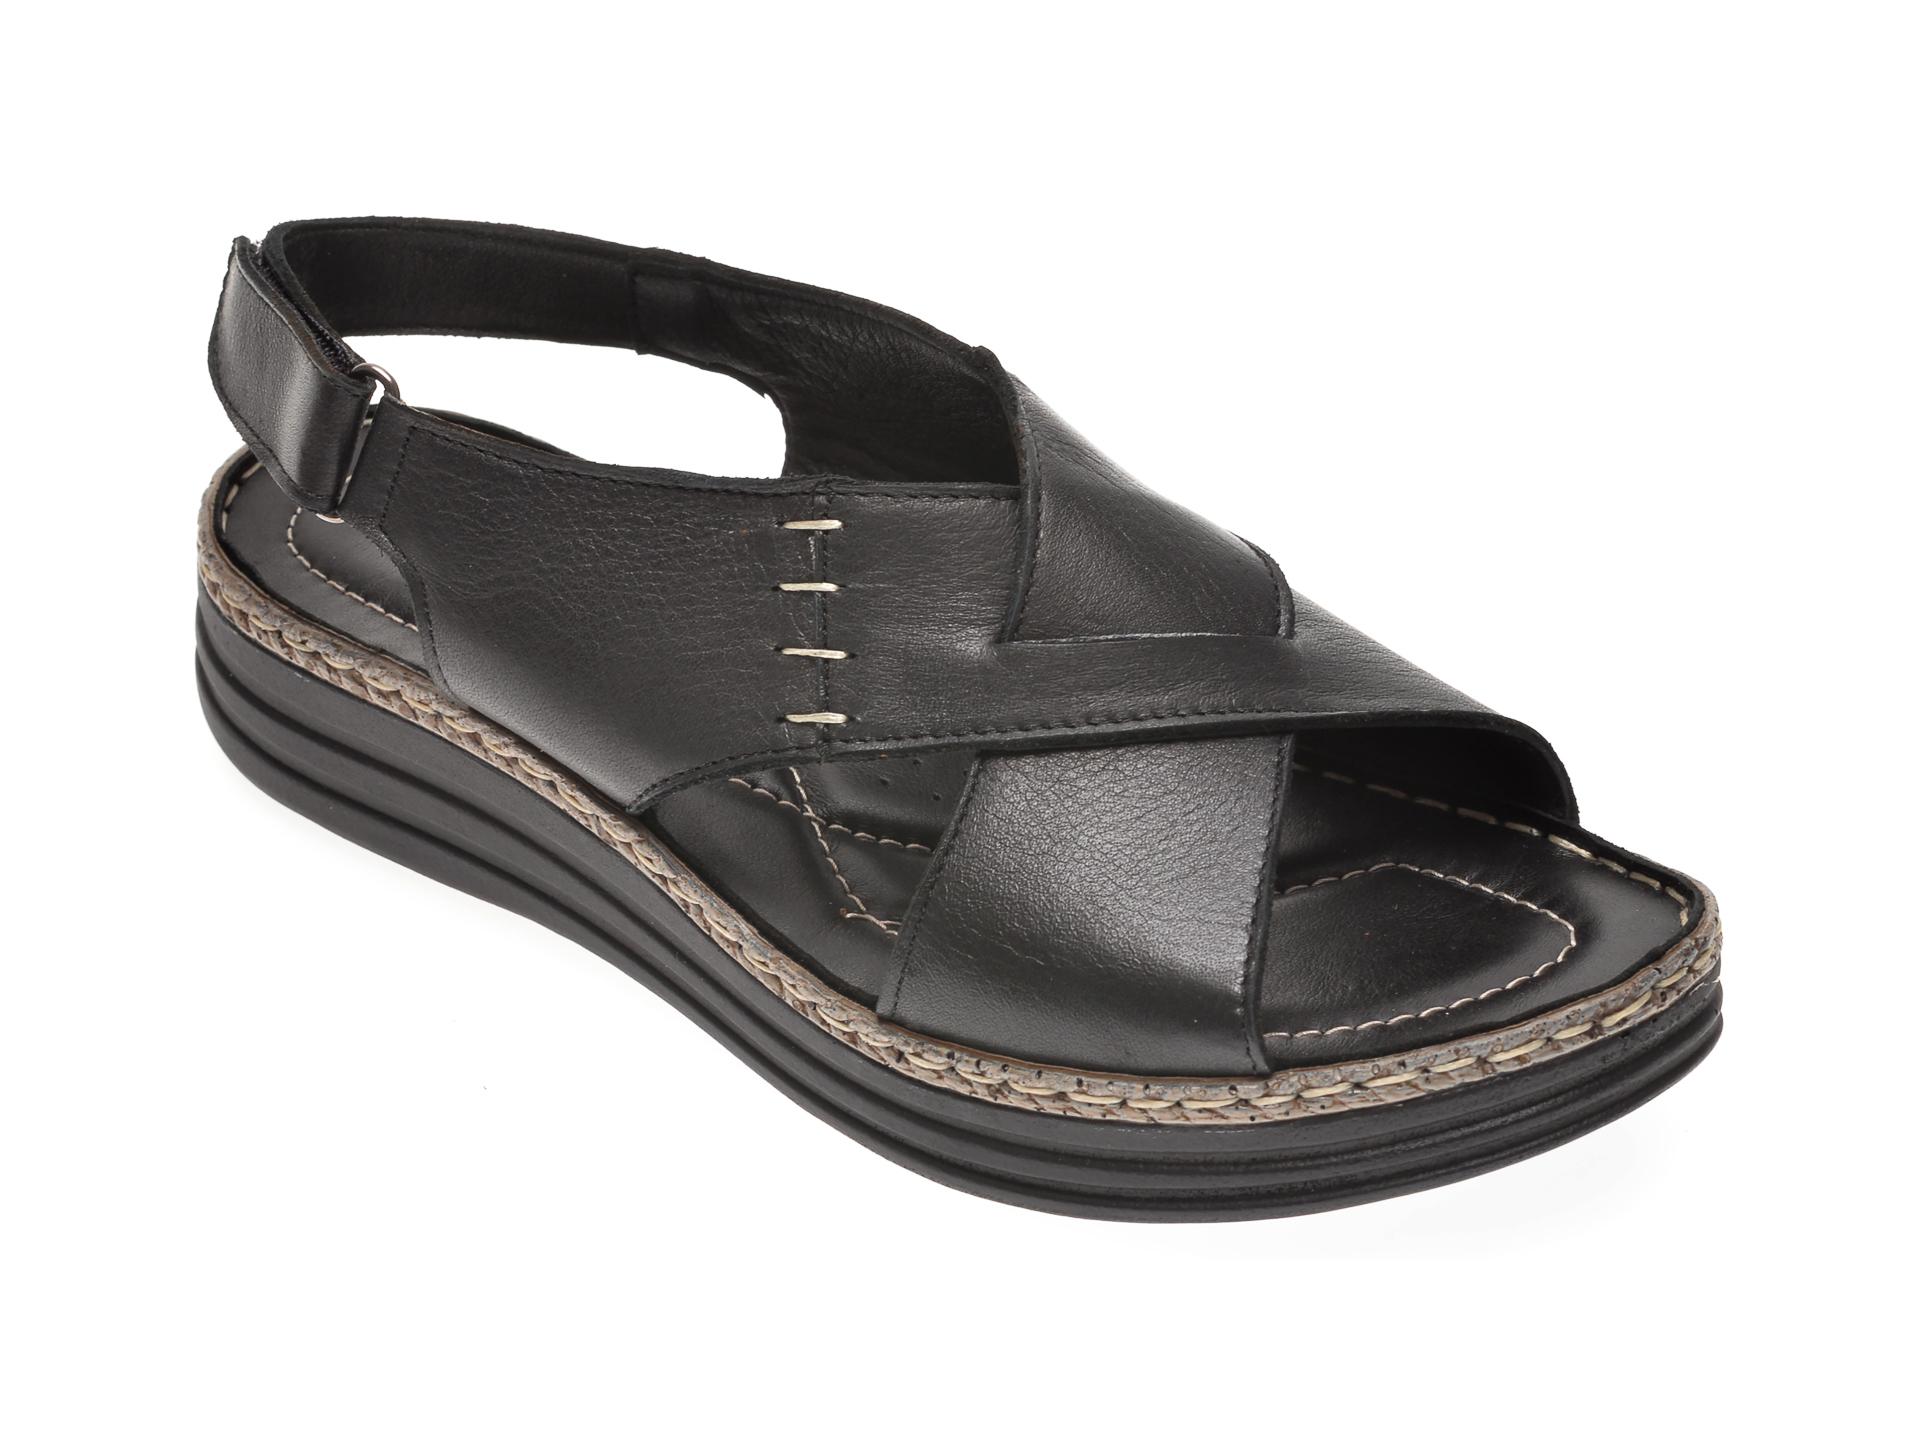 Sandale X TREND negre, 512, din piele naturala